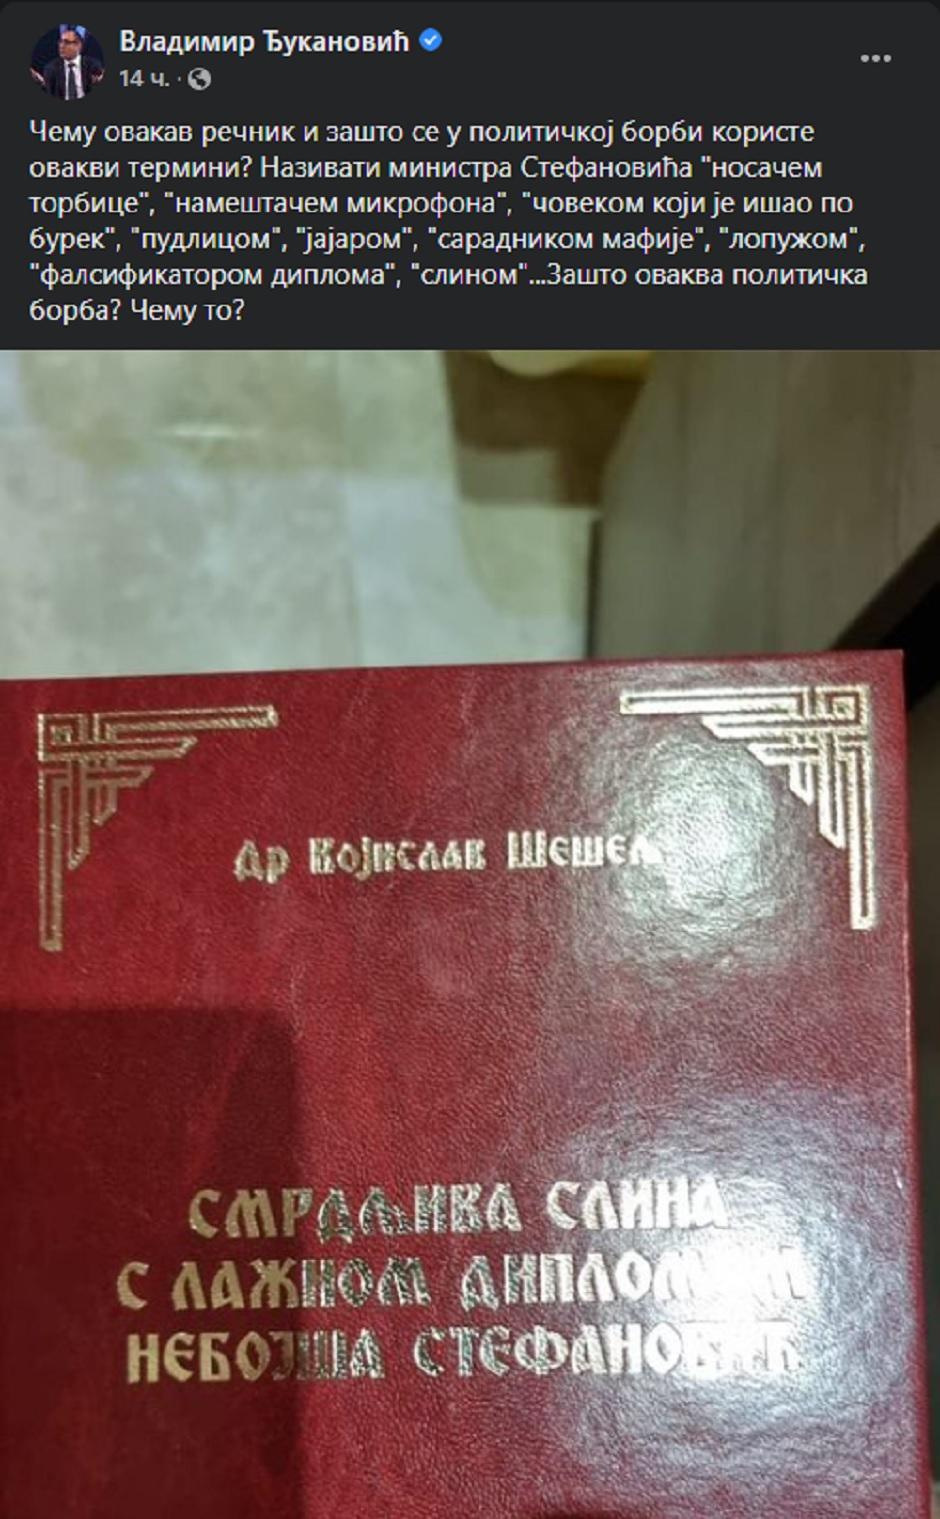 Fejsbuk status Vladimira Đukanovića